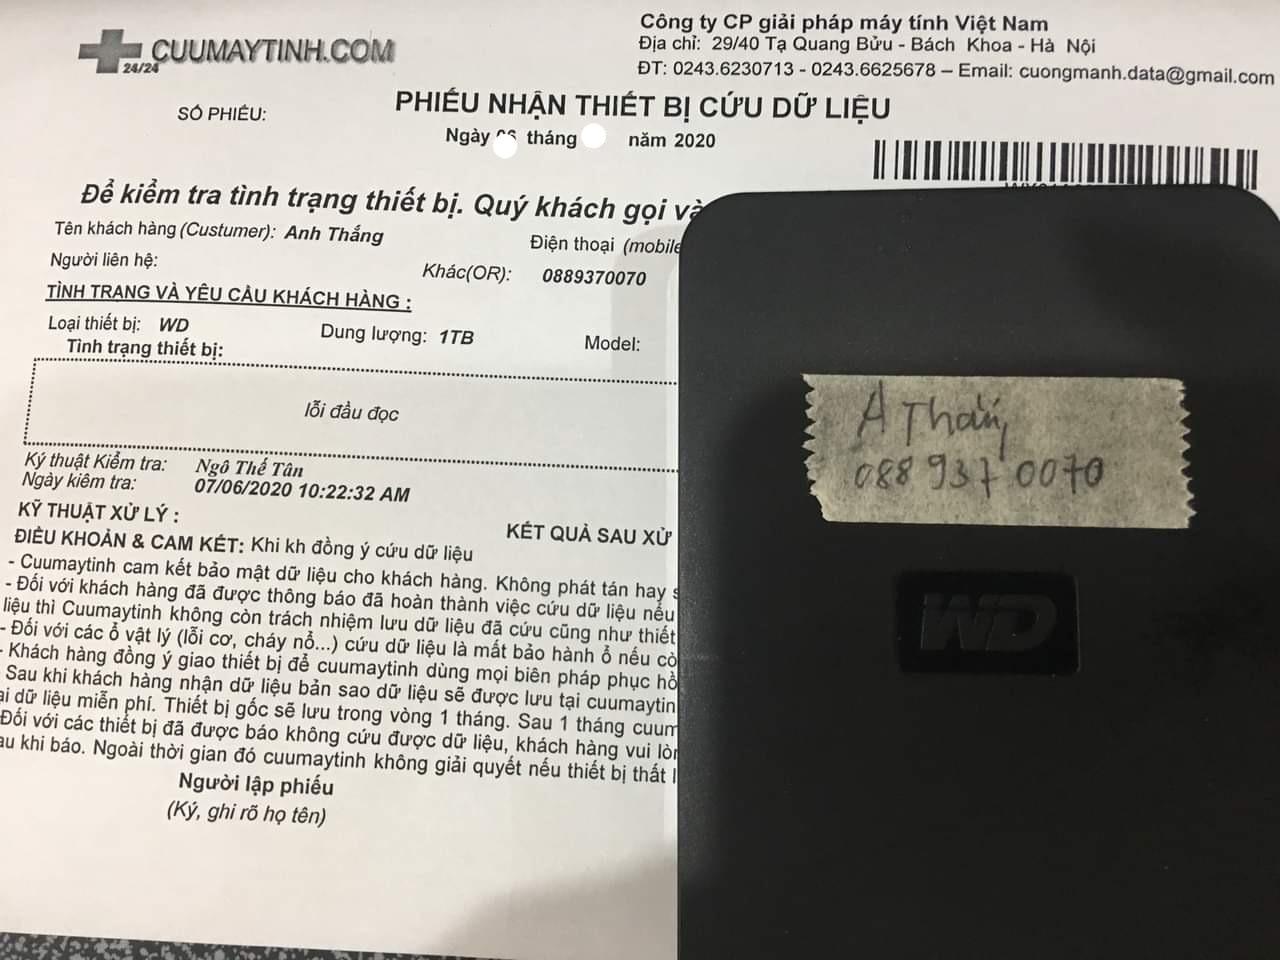 Lấy dữ liệu ổ cứng Western 1TB lỗi đầu đọc 05/08/2020 - cuumaytinh